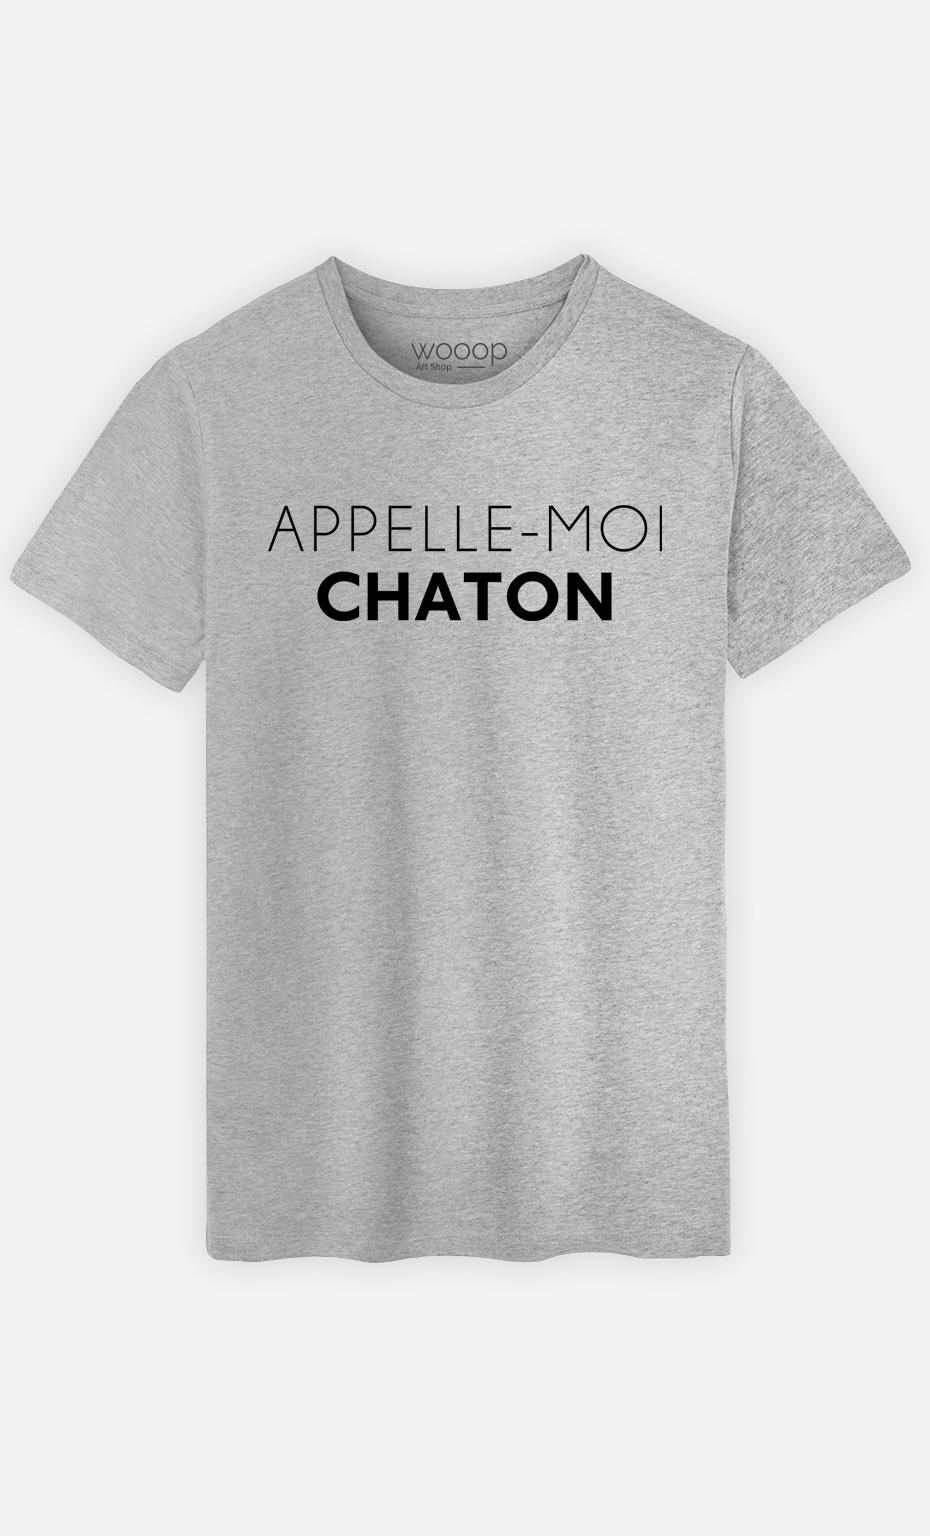 T-Shirt Homme Appelle moi chaton